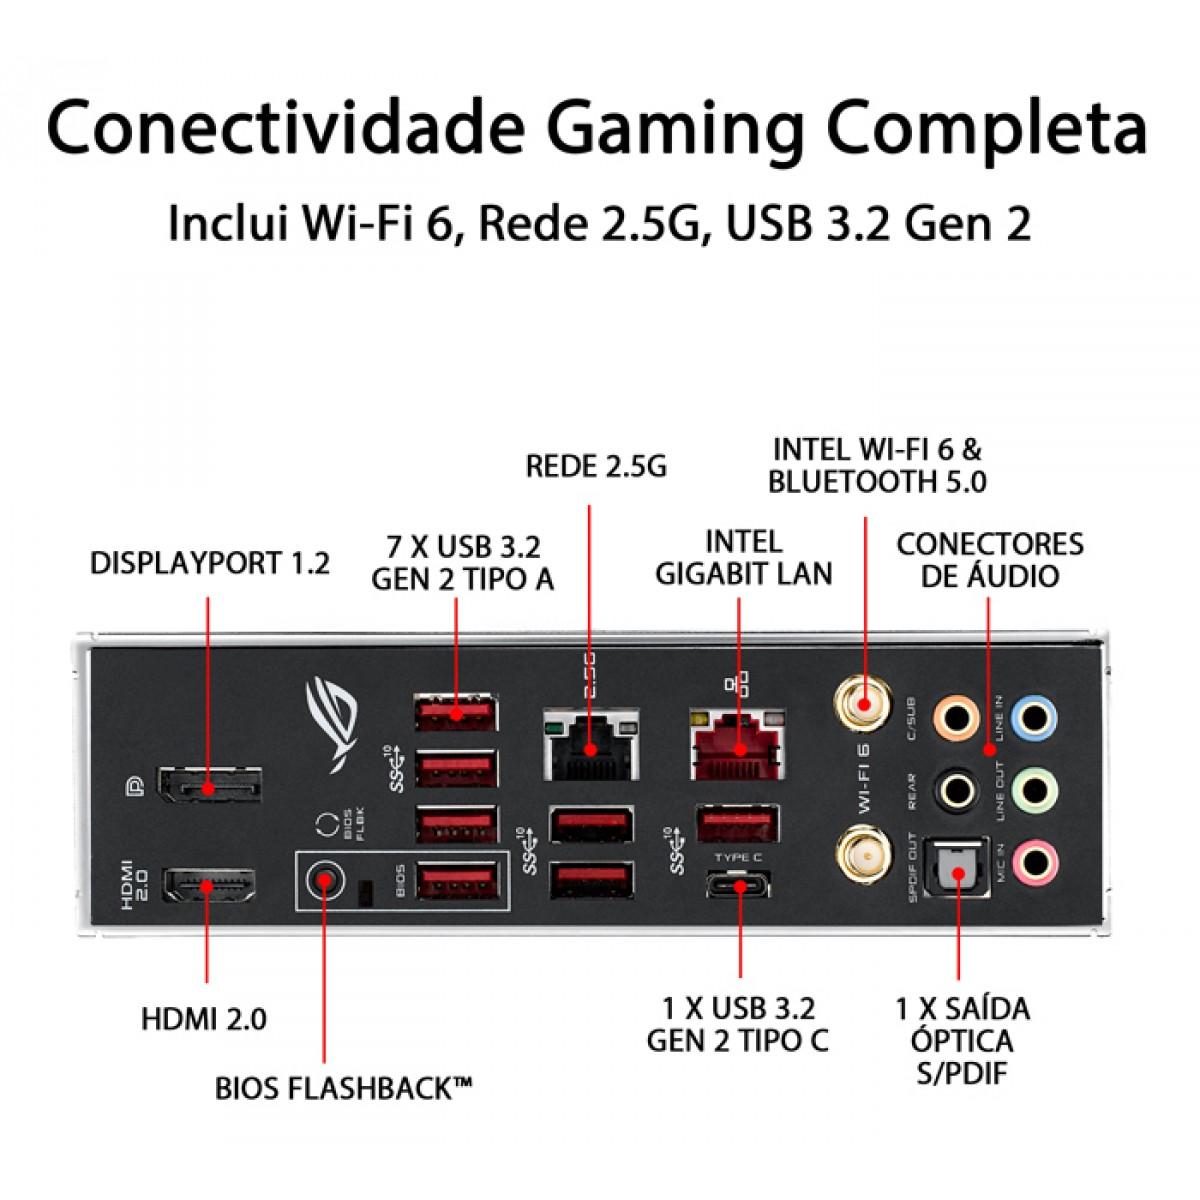 Placa Mãe Asus Rog Strix X570-E Gaming, Chipset X570, AMD AM4, ATX, DDR4